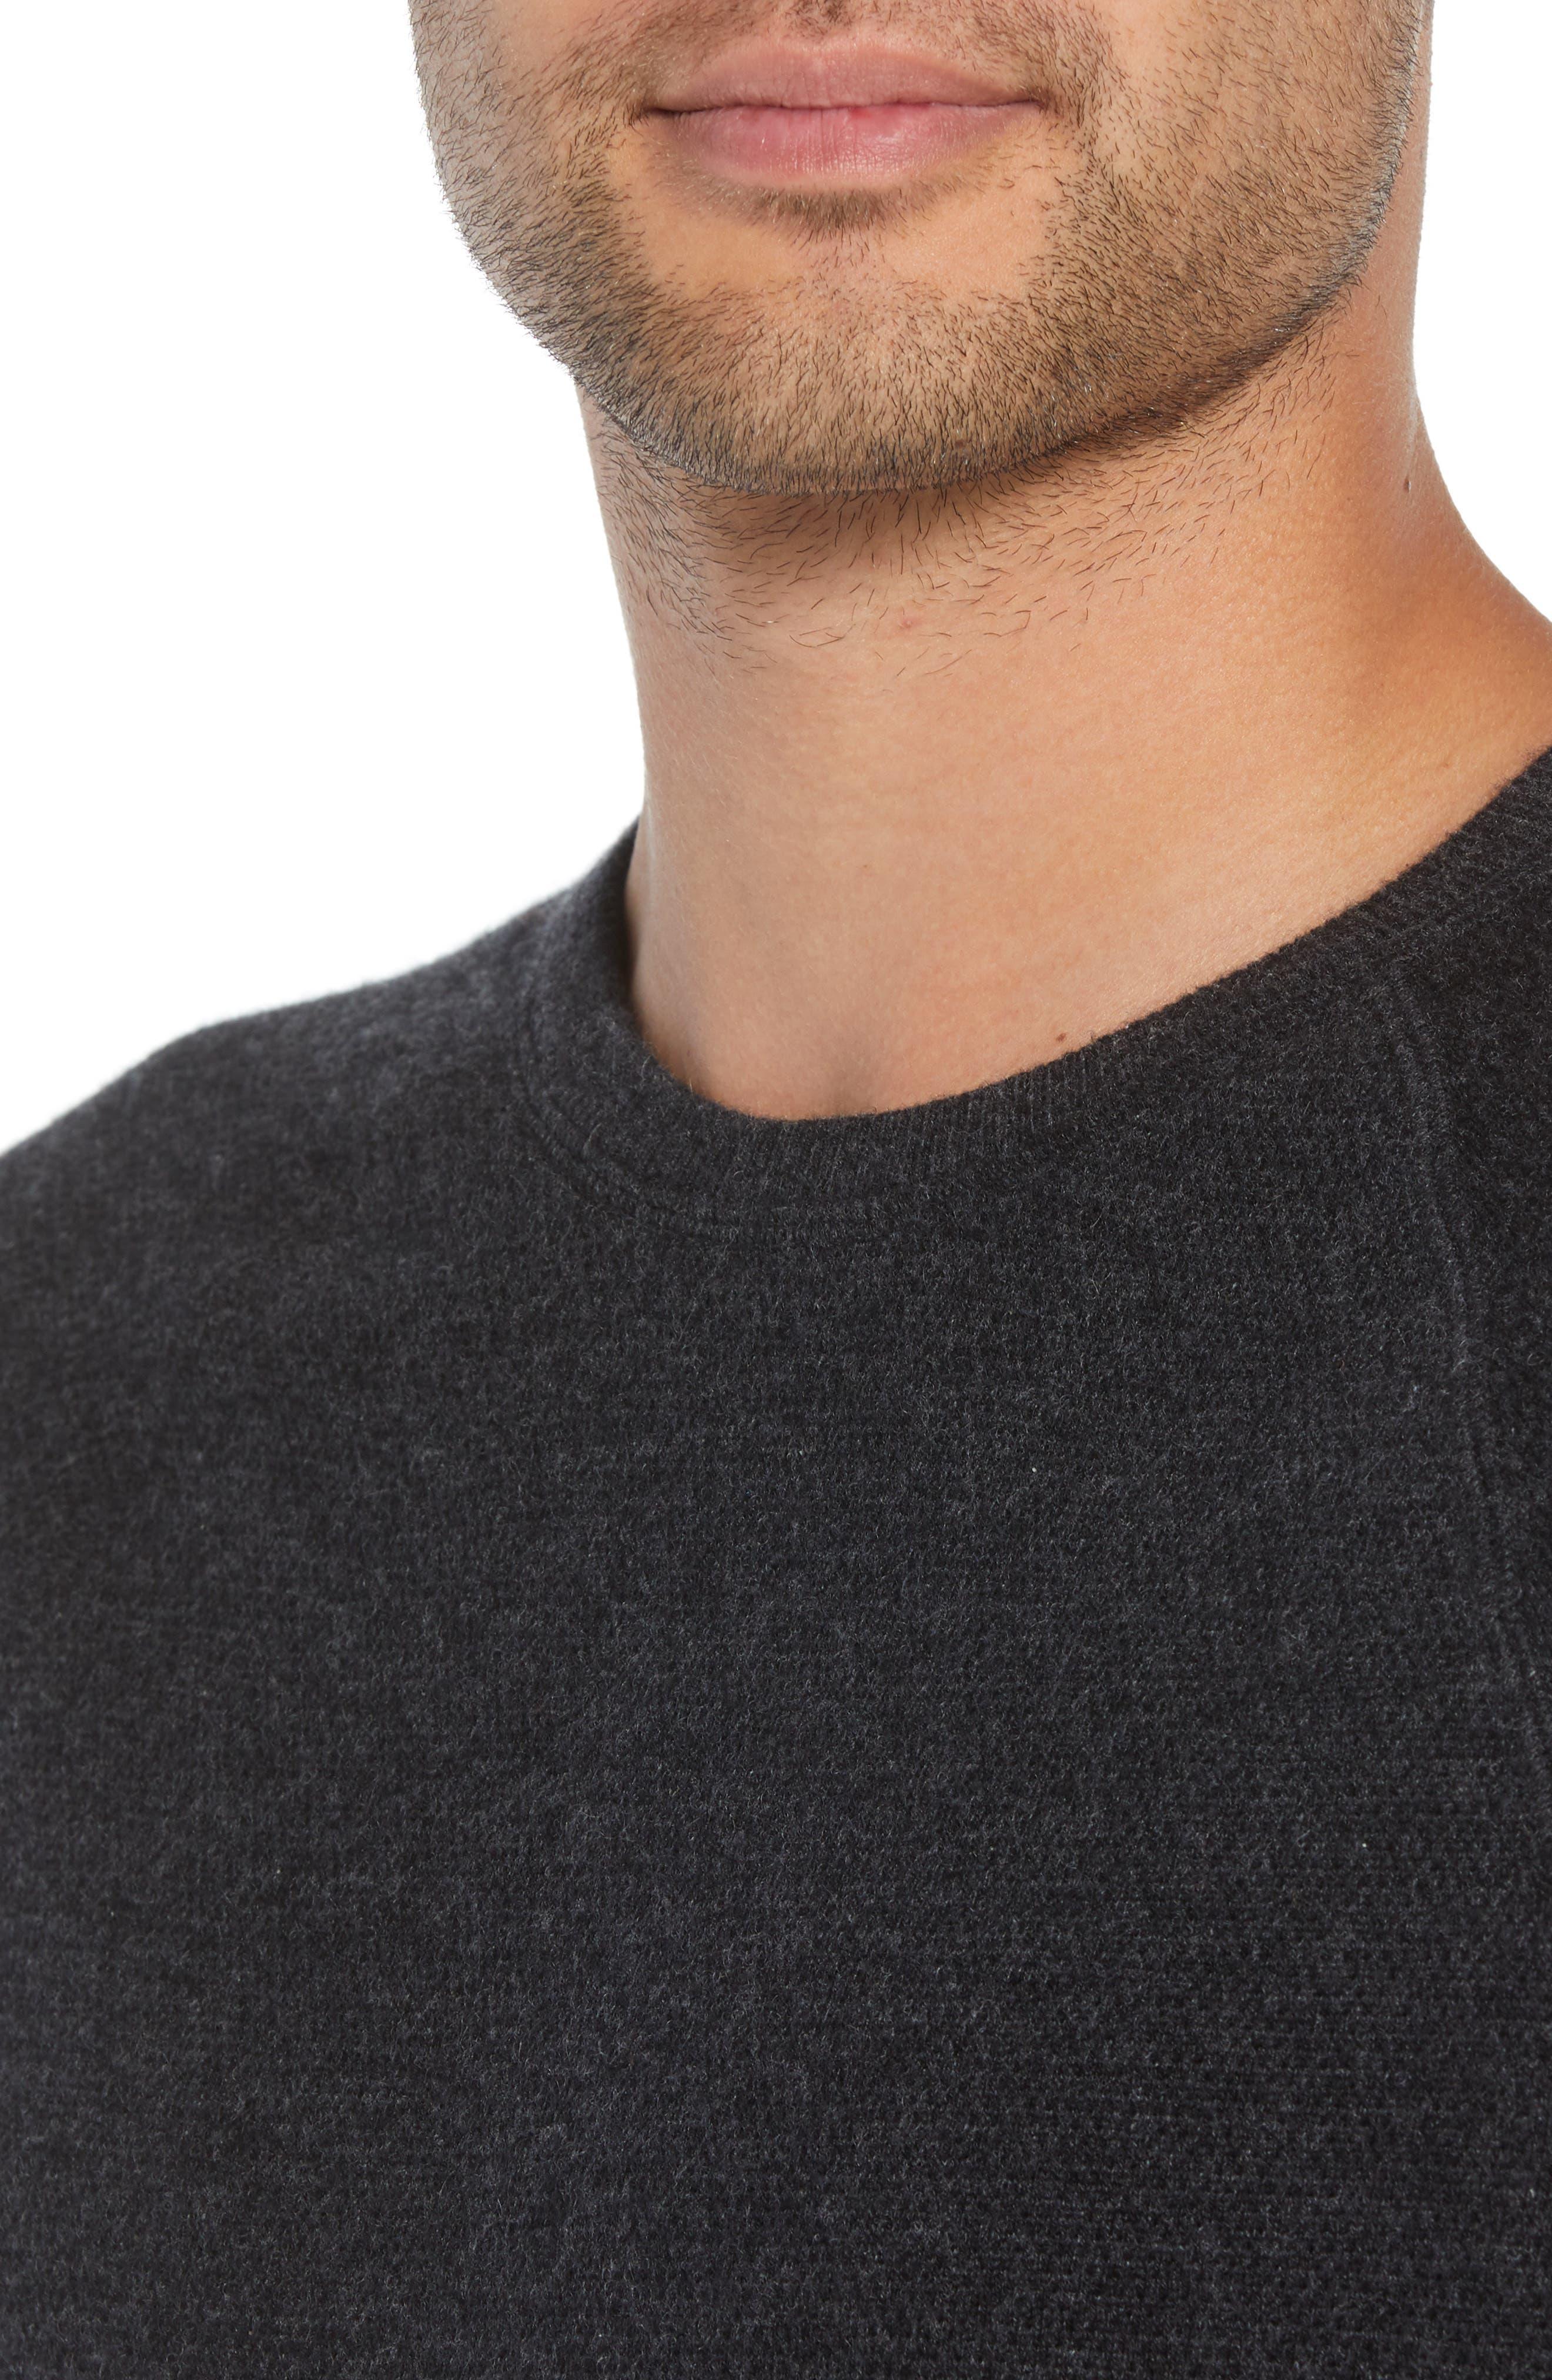 Bird's Eye Sweater,                             Alternate thumbnail 4, color,                             H CHARCOAL/ BLACK